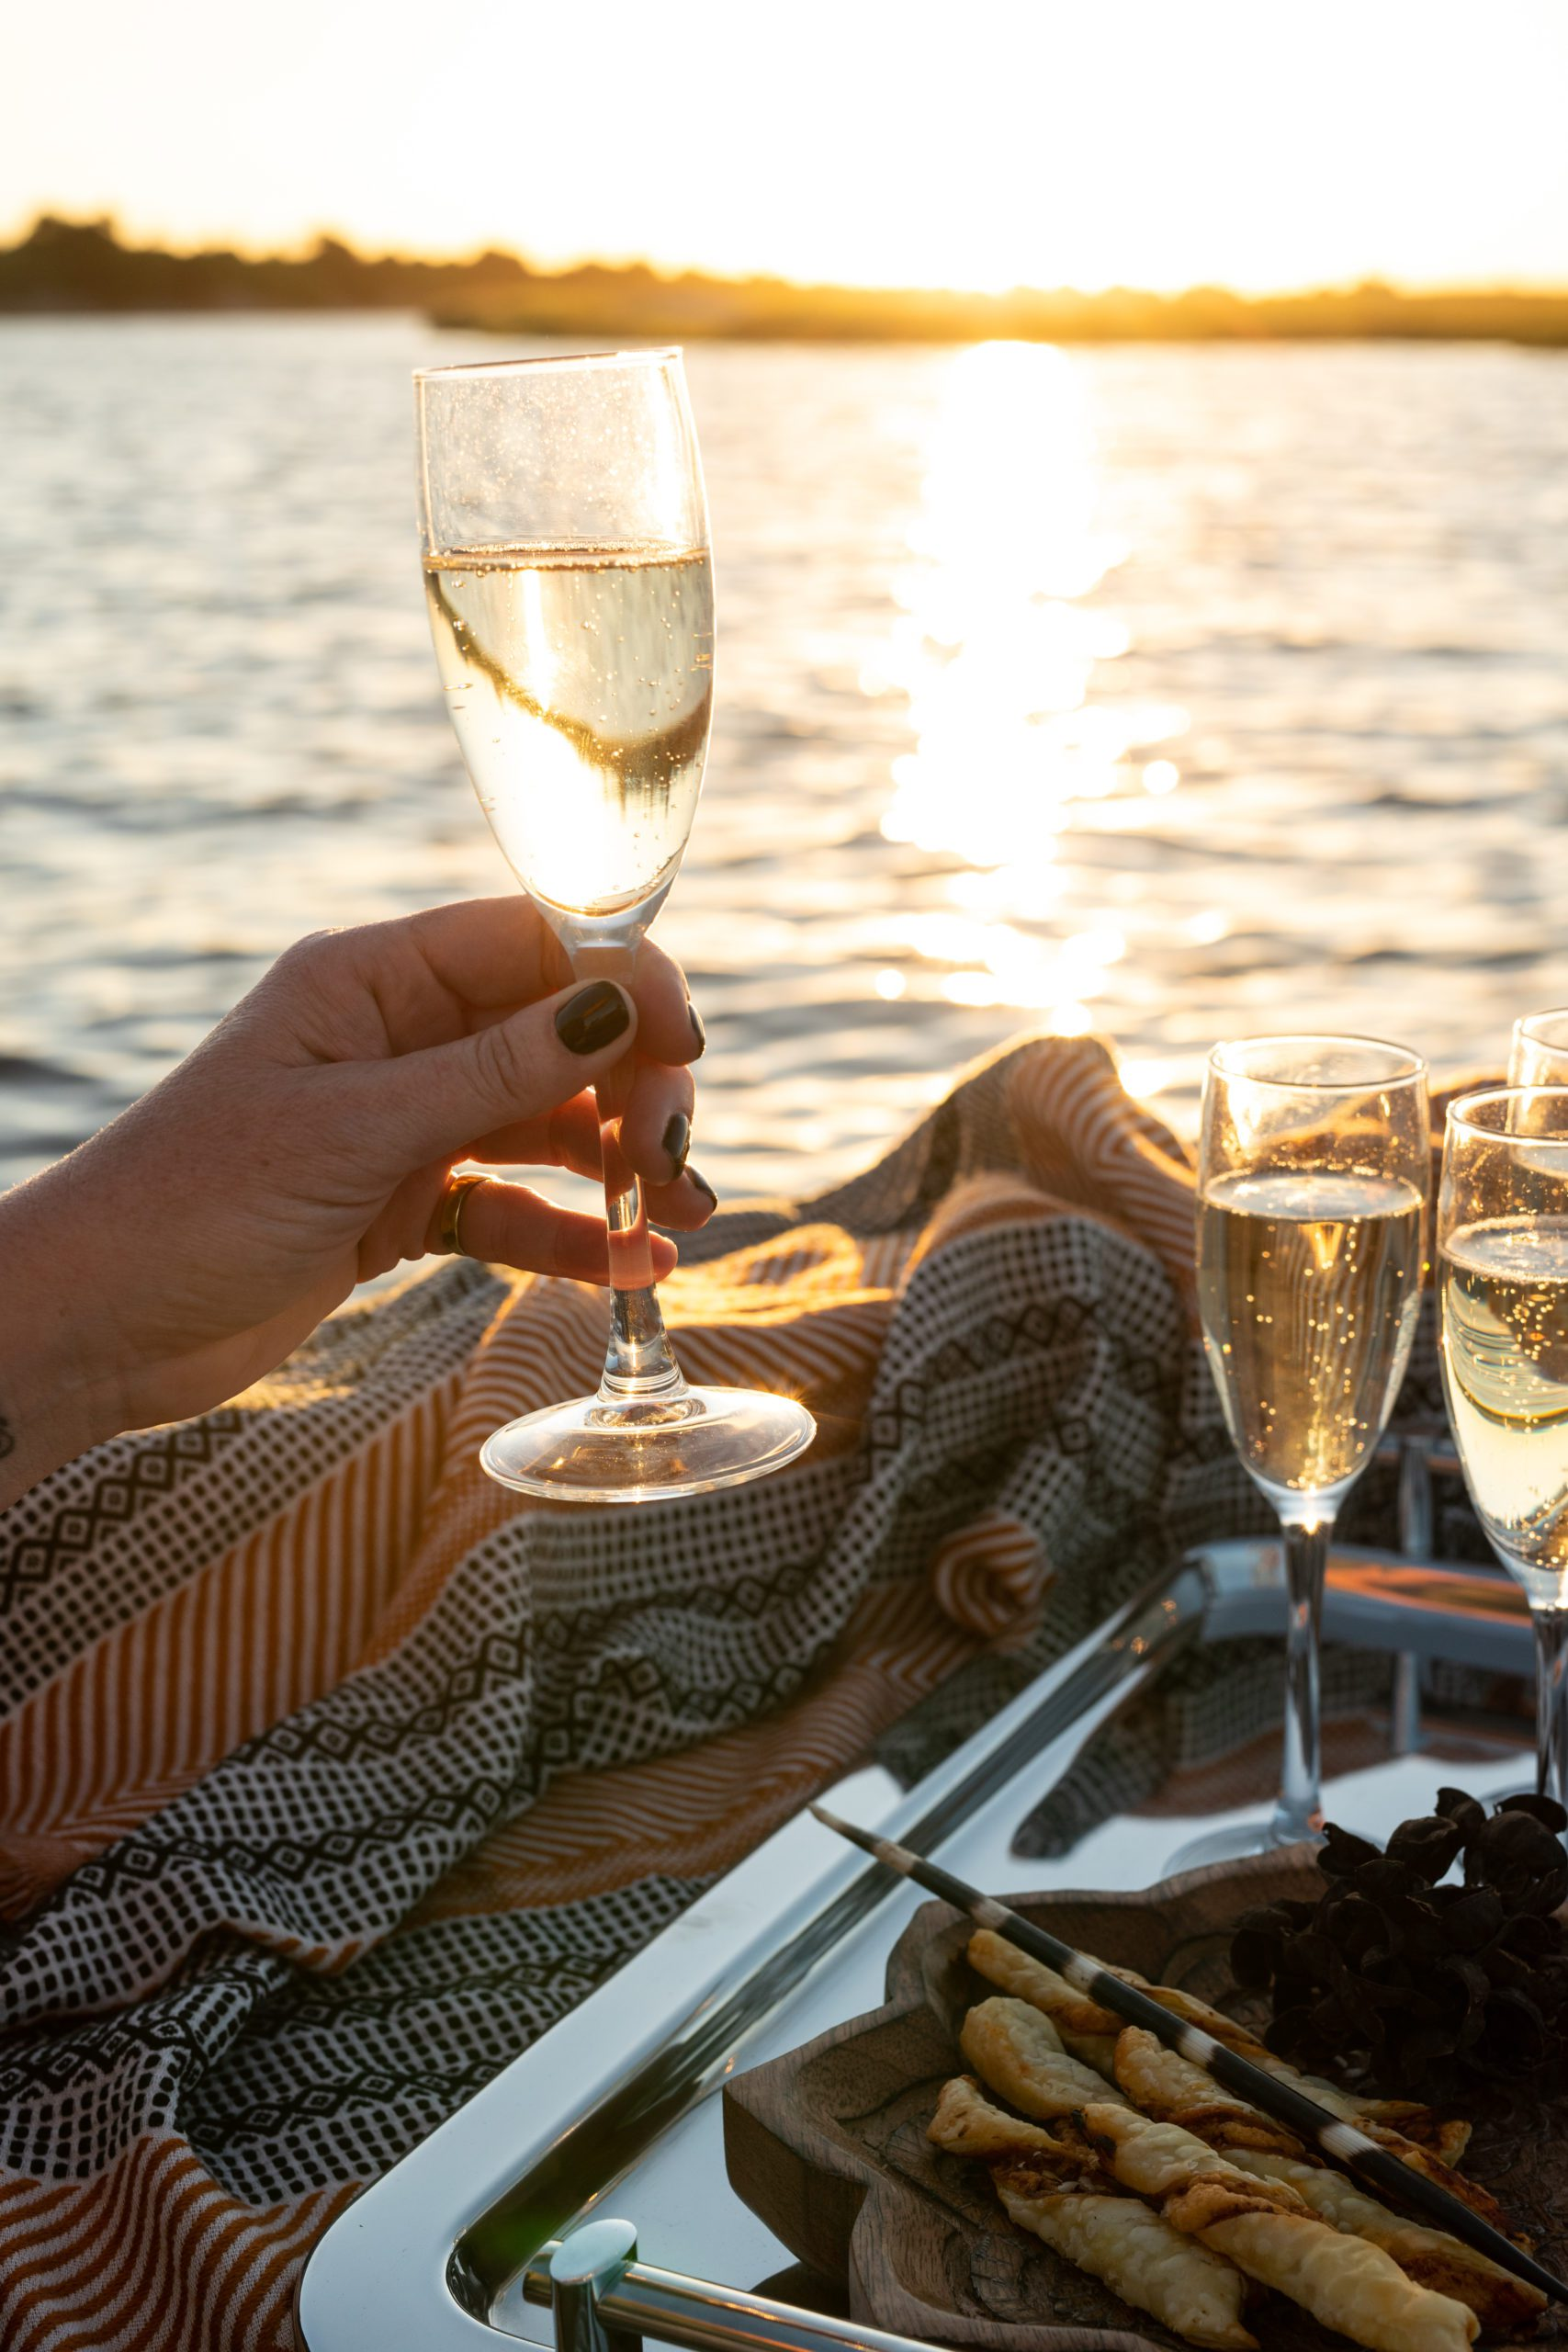 Chobe Princess boat cruise classes of champagne at sunset